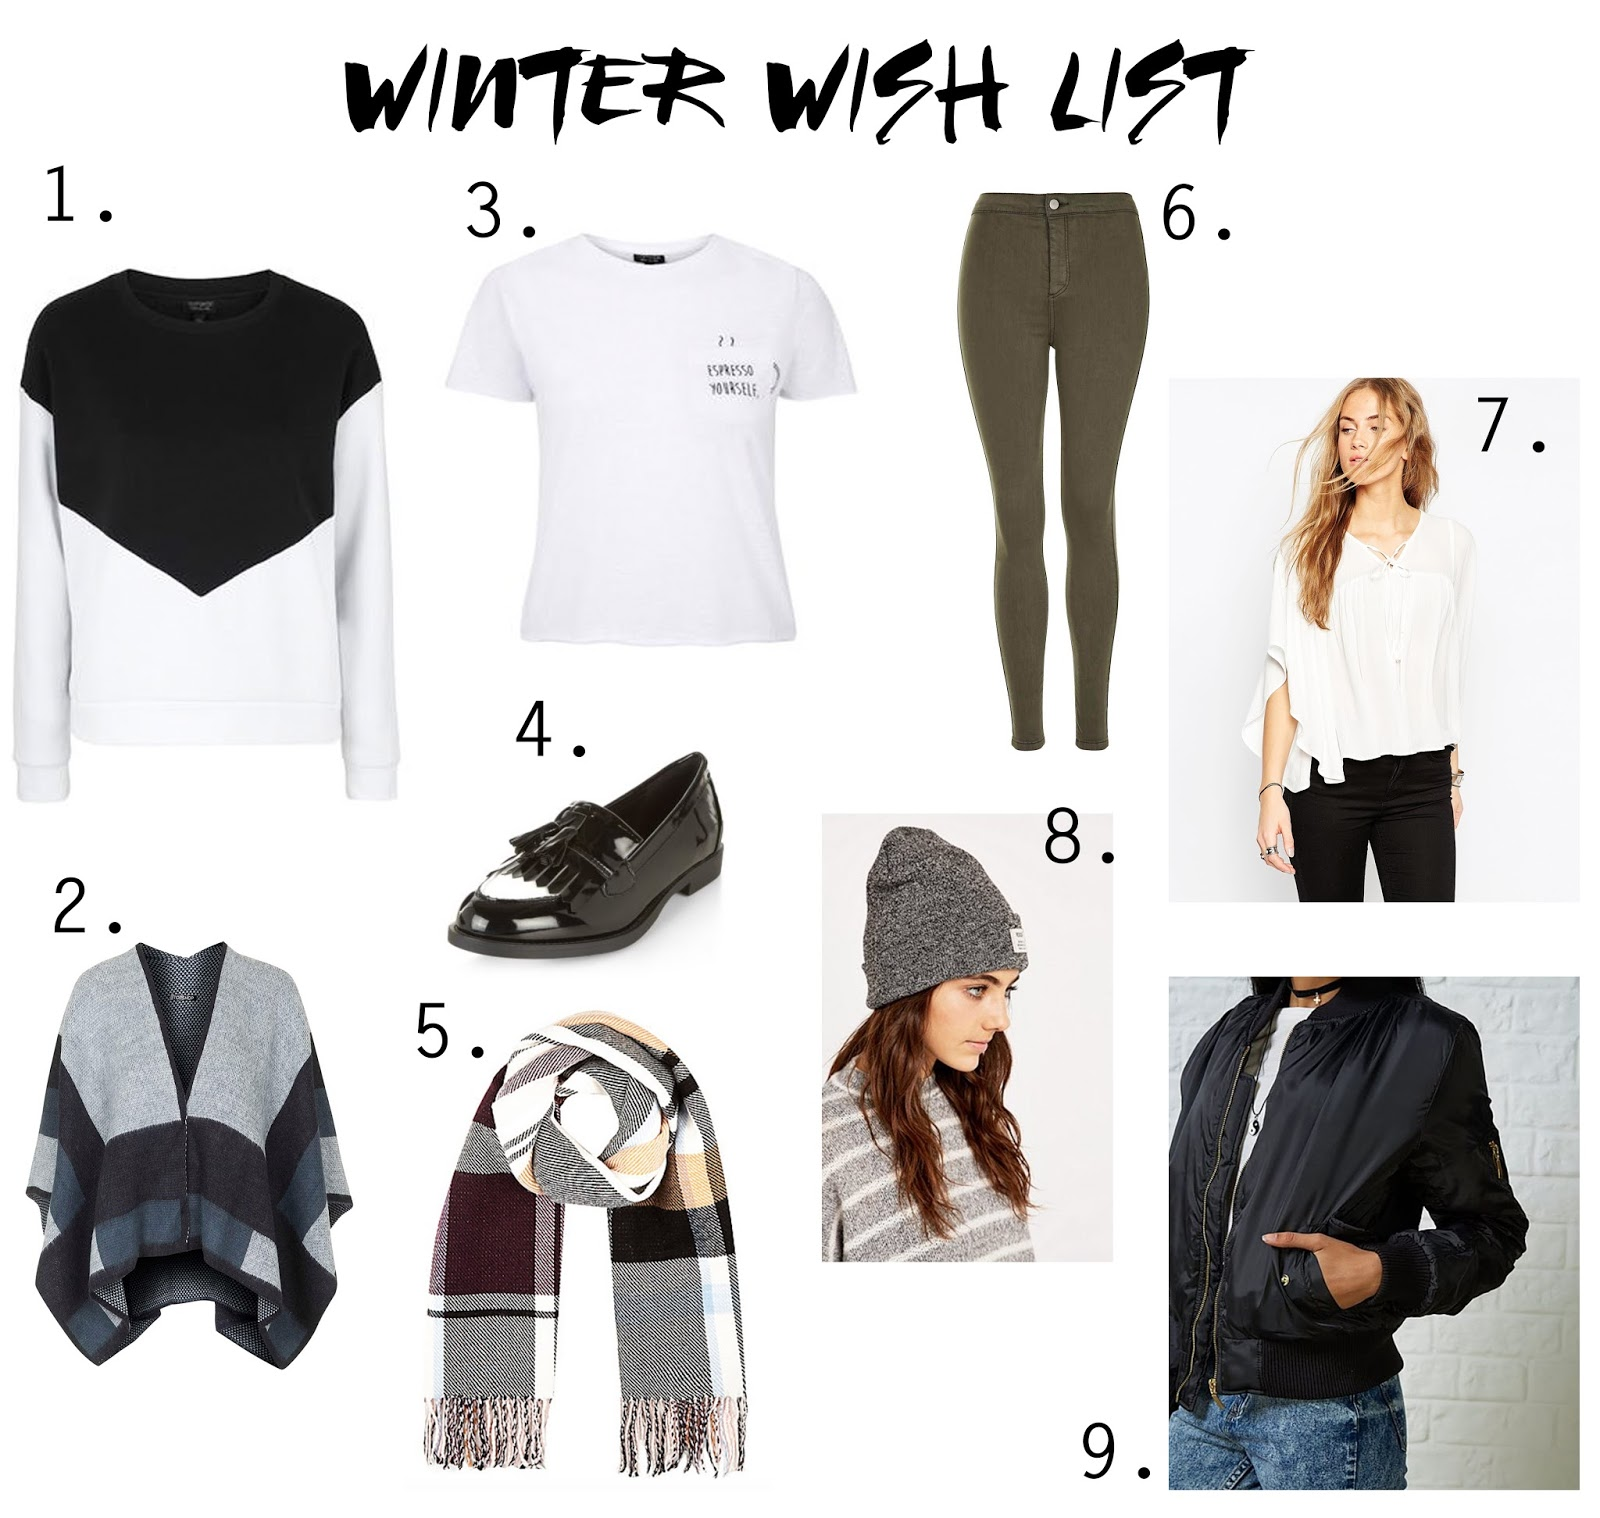 Winter clothing wish list 2015